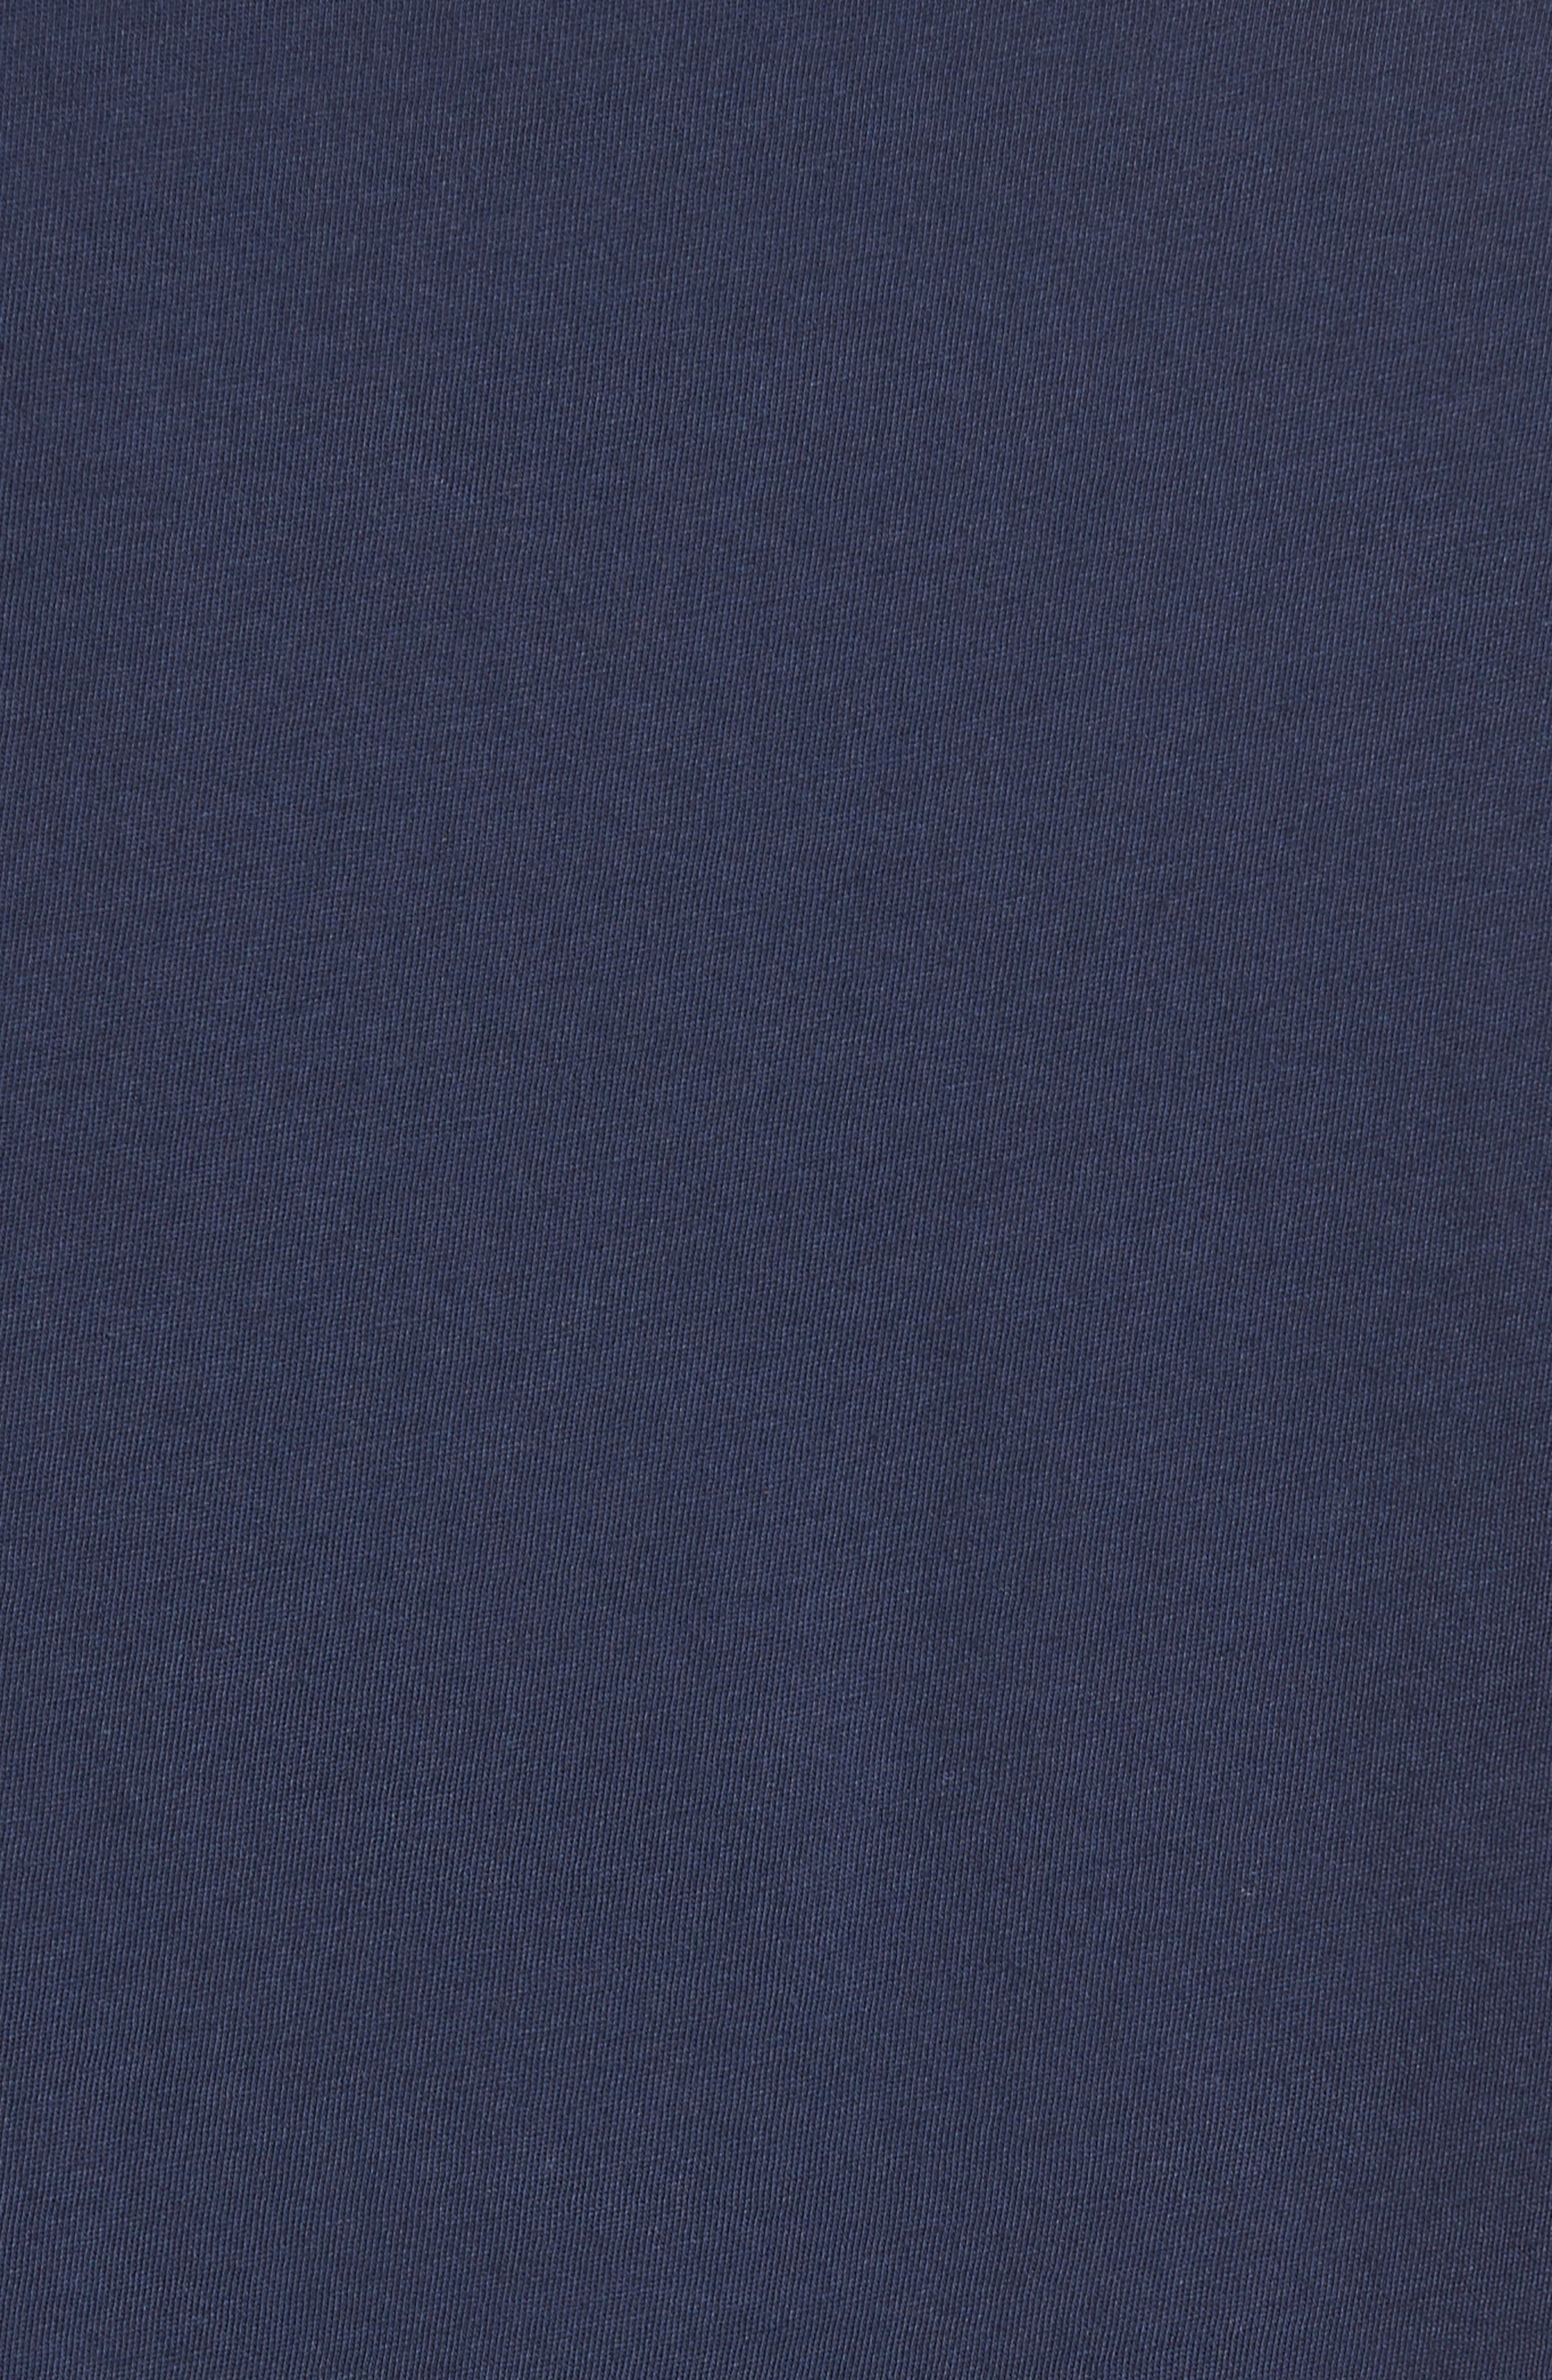 Regular Fit V-Neck T-Shirt,                             Alternate thumbnail 6, color,                             Starry Night